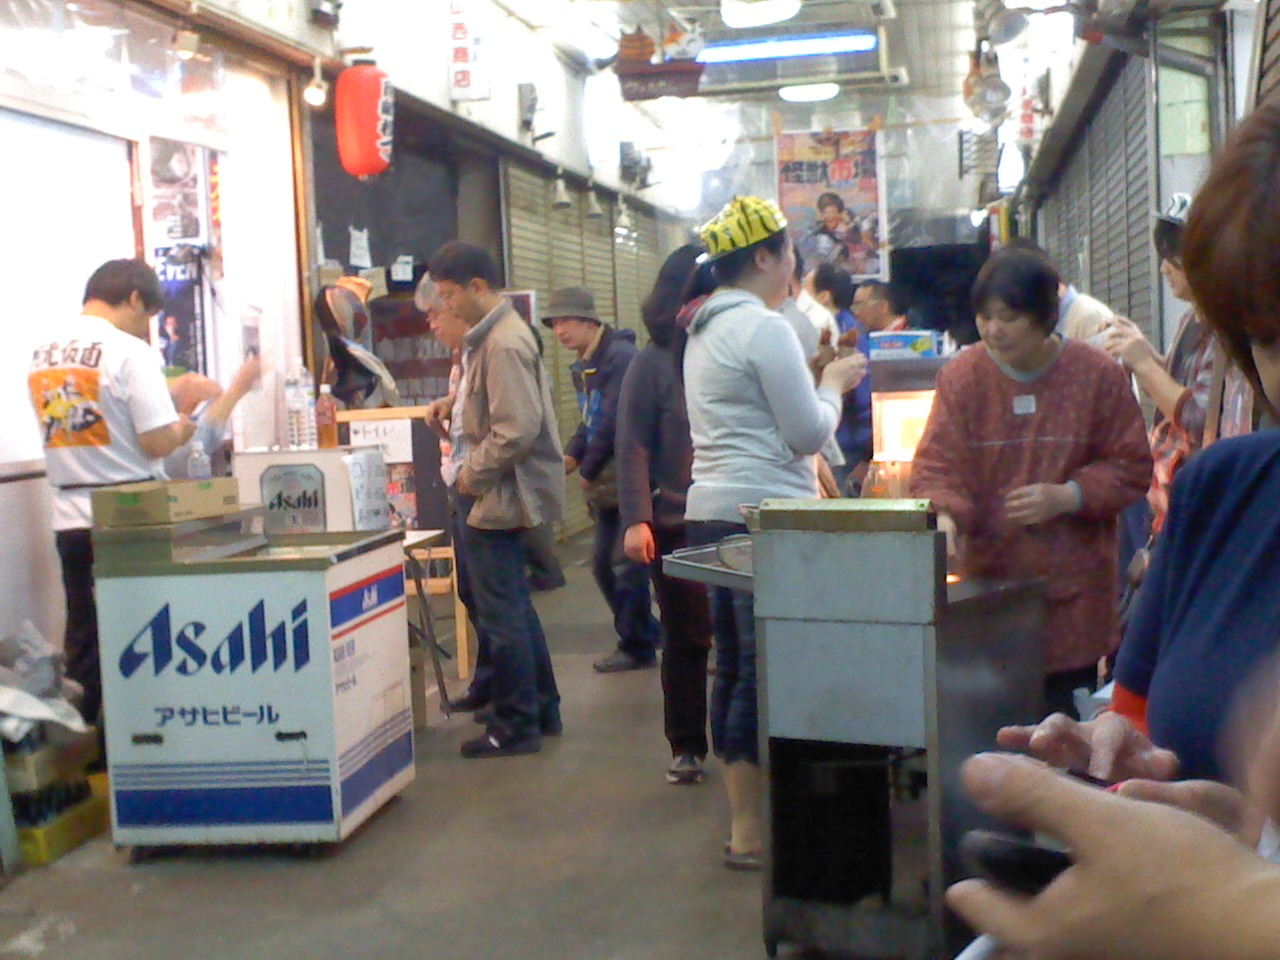 怪獣市場前夜祭終わる!_a0196732_022533.jpg